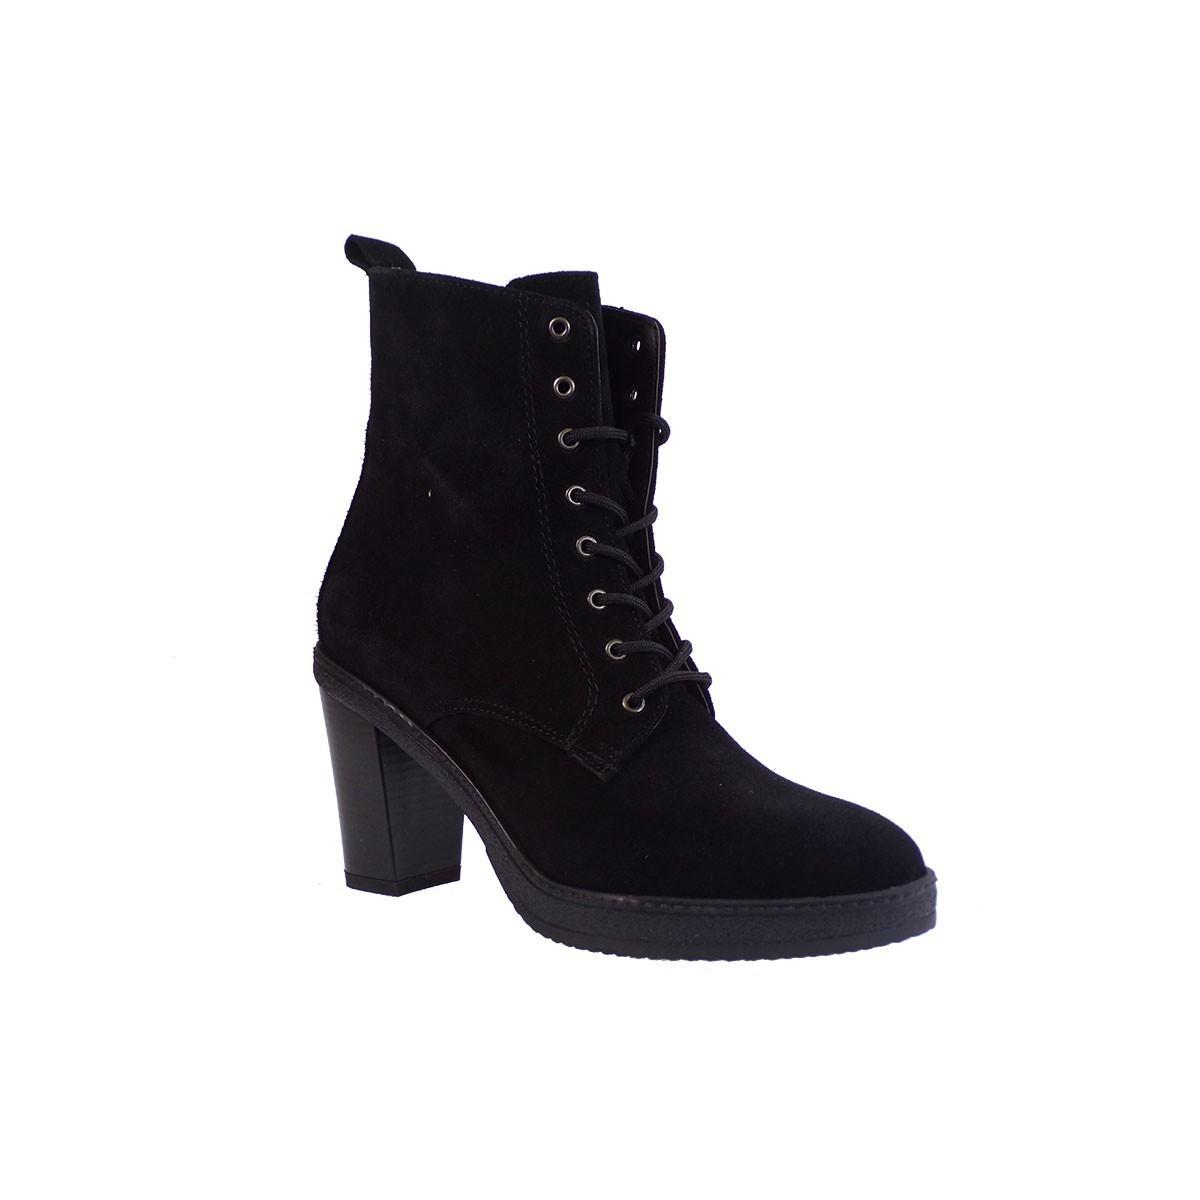 Envie Shoes Γυναικεία Μποτάκια Αρβυλάκια Ε02-06341 Μαύρο Δέρμα Καστόρι